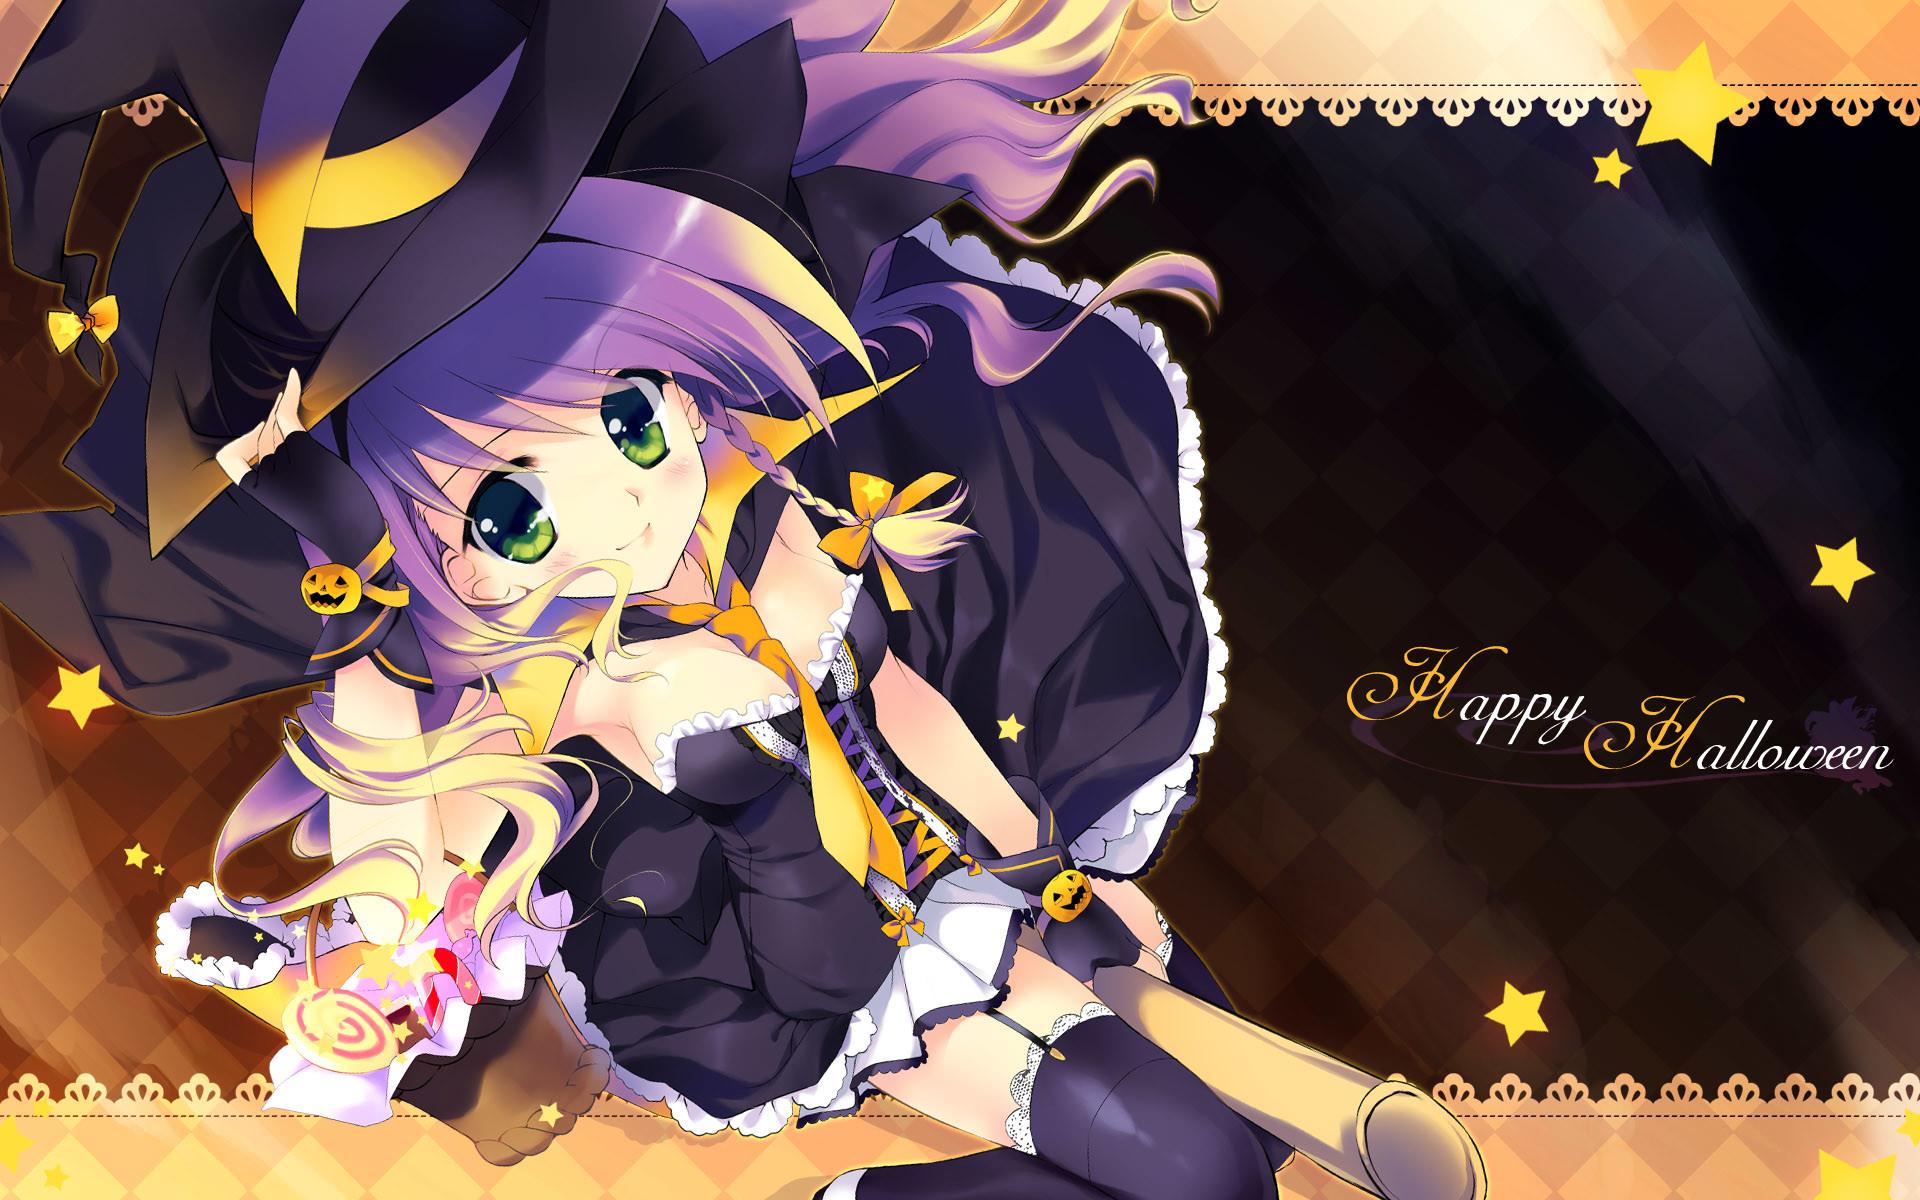 Halloween_Anime_Wallpaper_Collection-15.jpg_1317460067532.jpg